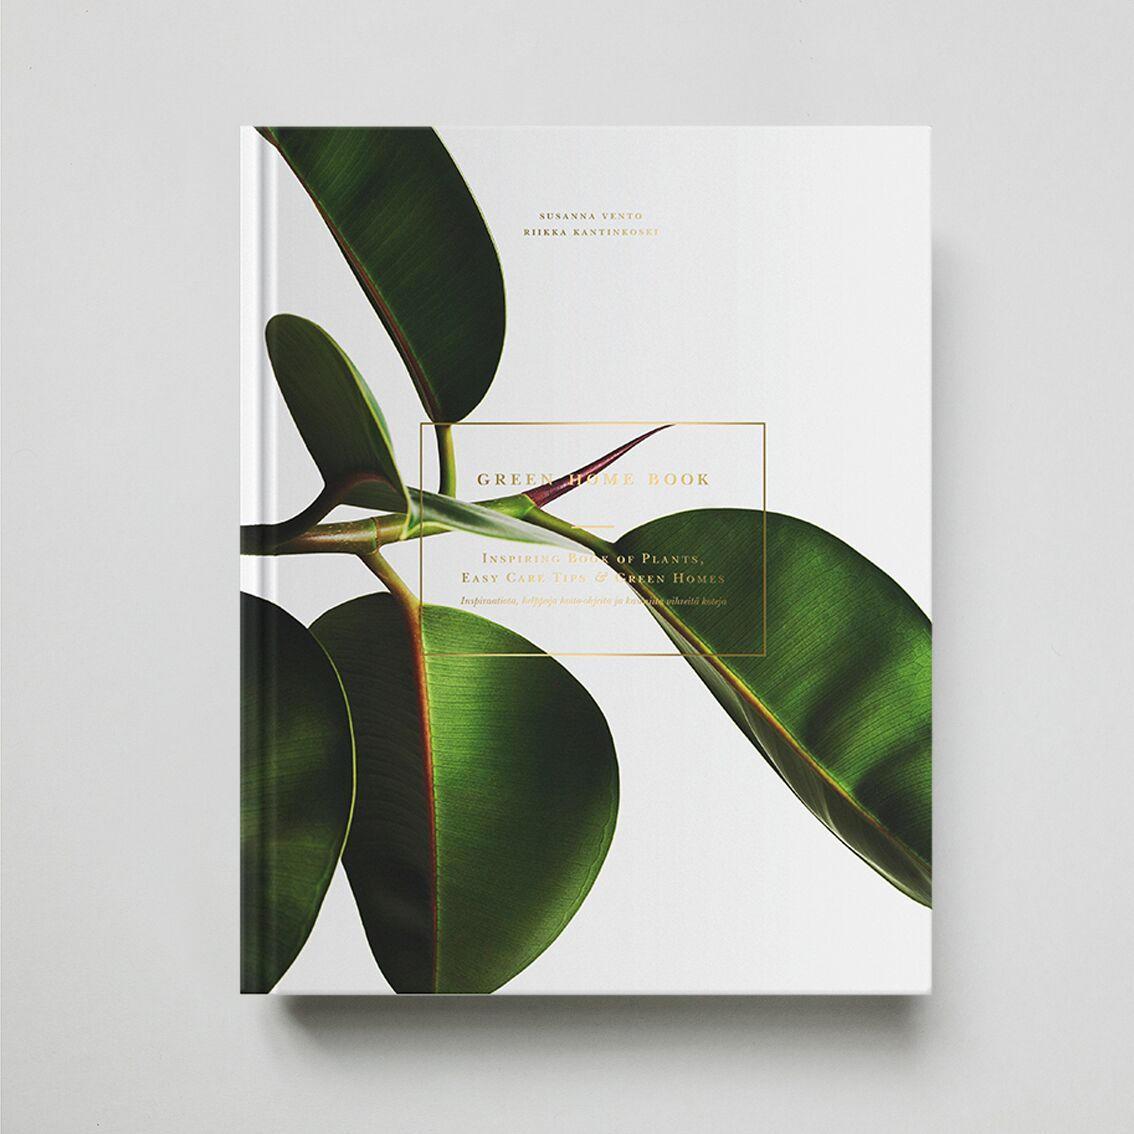 Green Home Book, zelená barva, papír